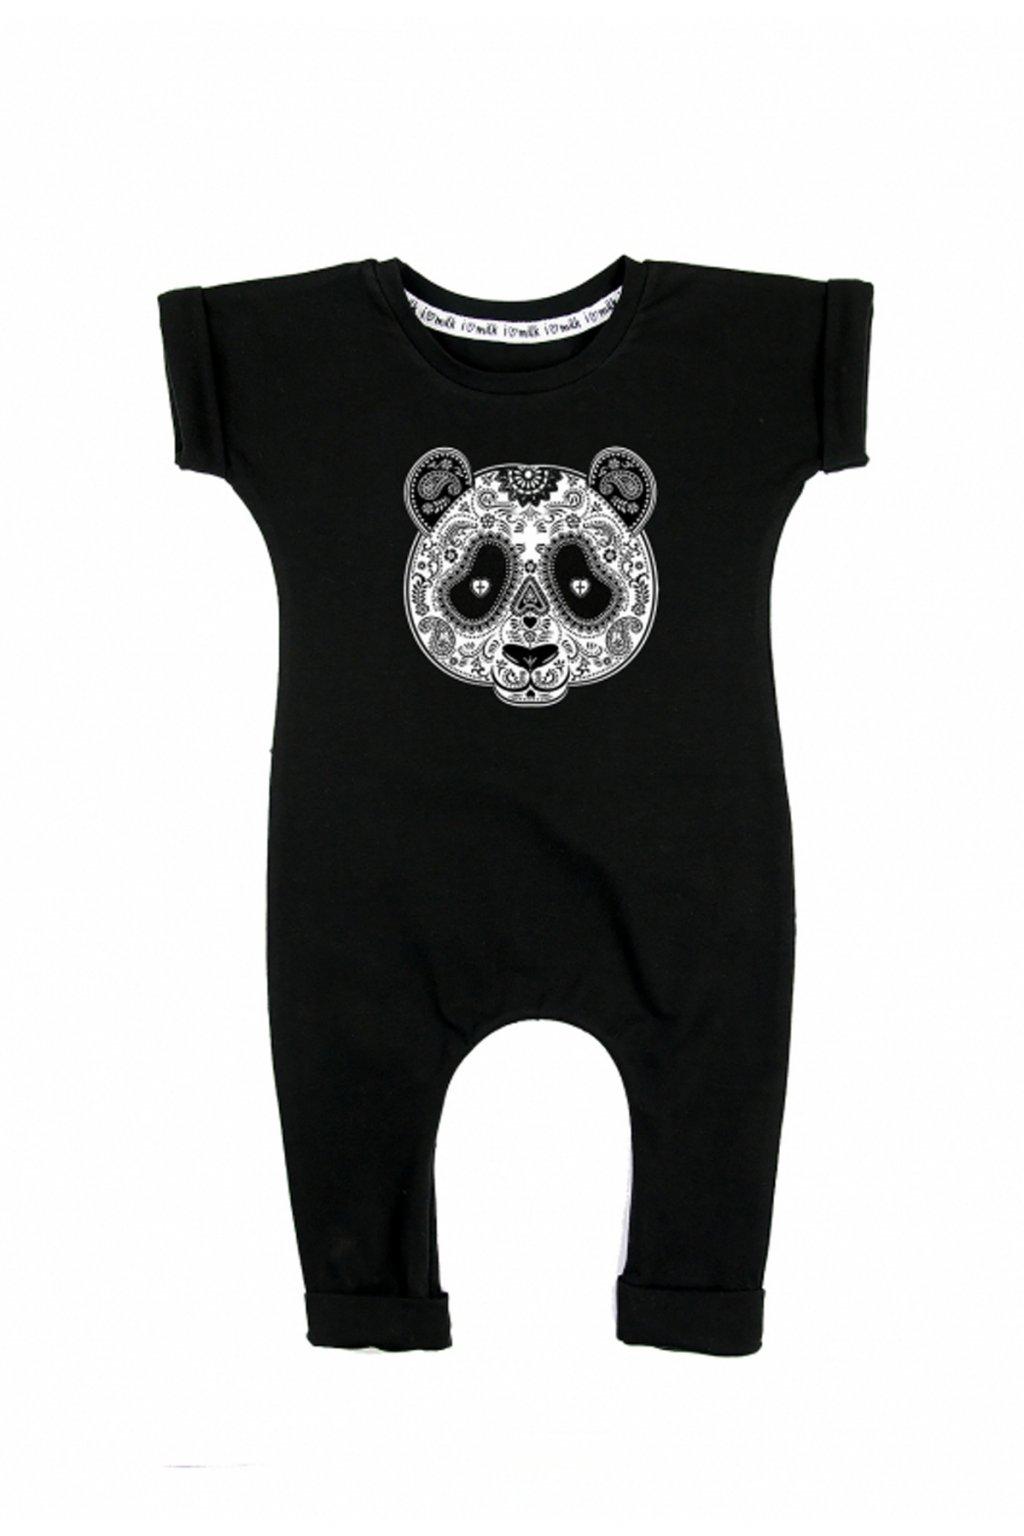 I LOVE MILK Overal Pandaskull 1